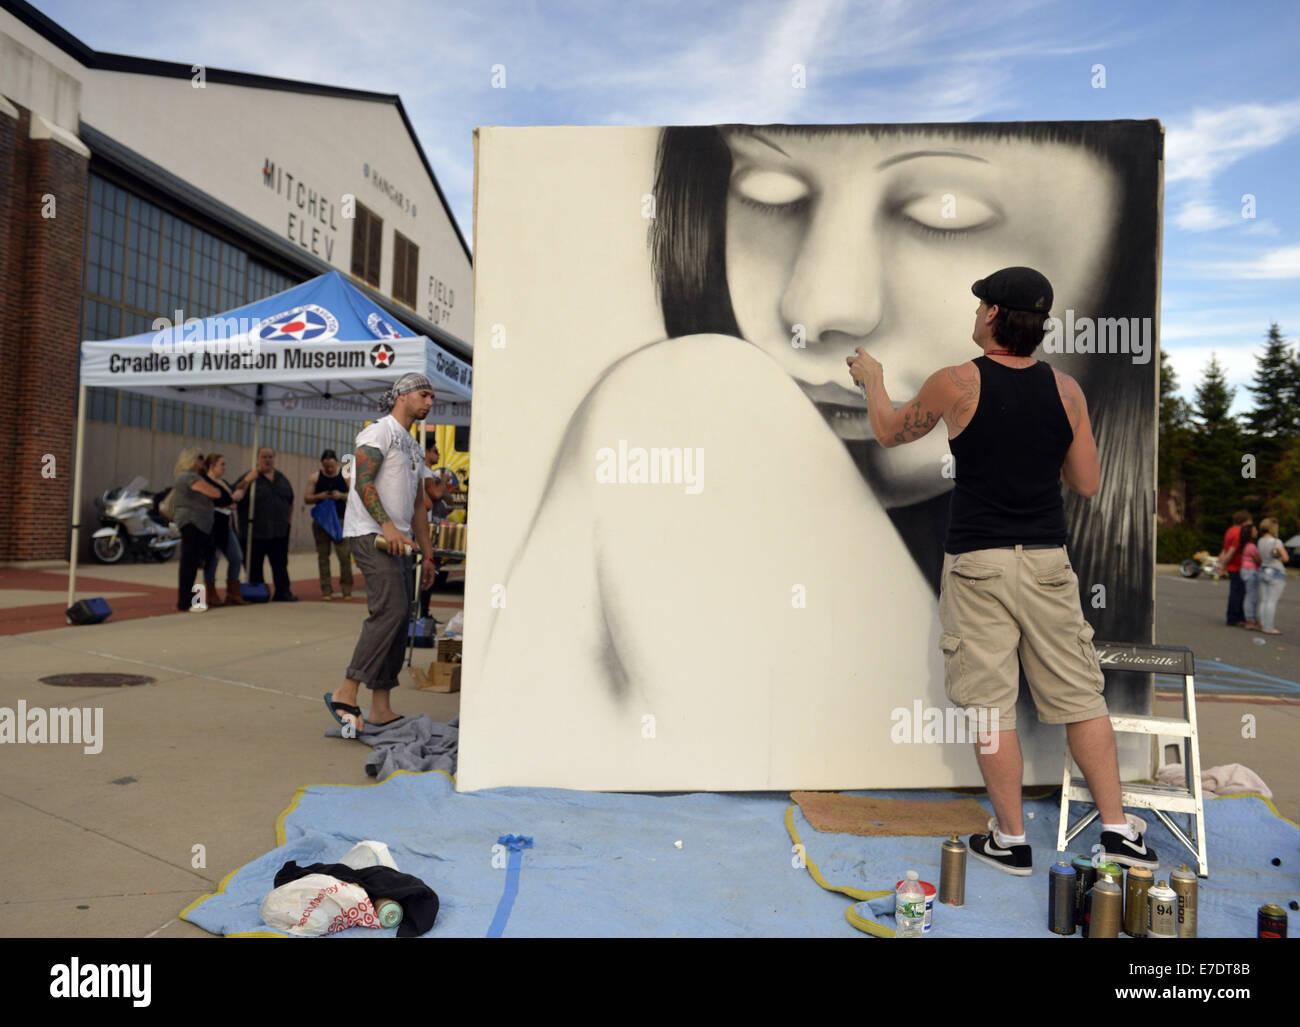 Garden City, New York, USA. 14th Sep, 2014. SEAN GRIFFEN, aka NME, of Freeport, is a graffiti artist creating an - Stock Image